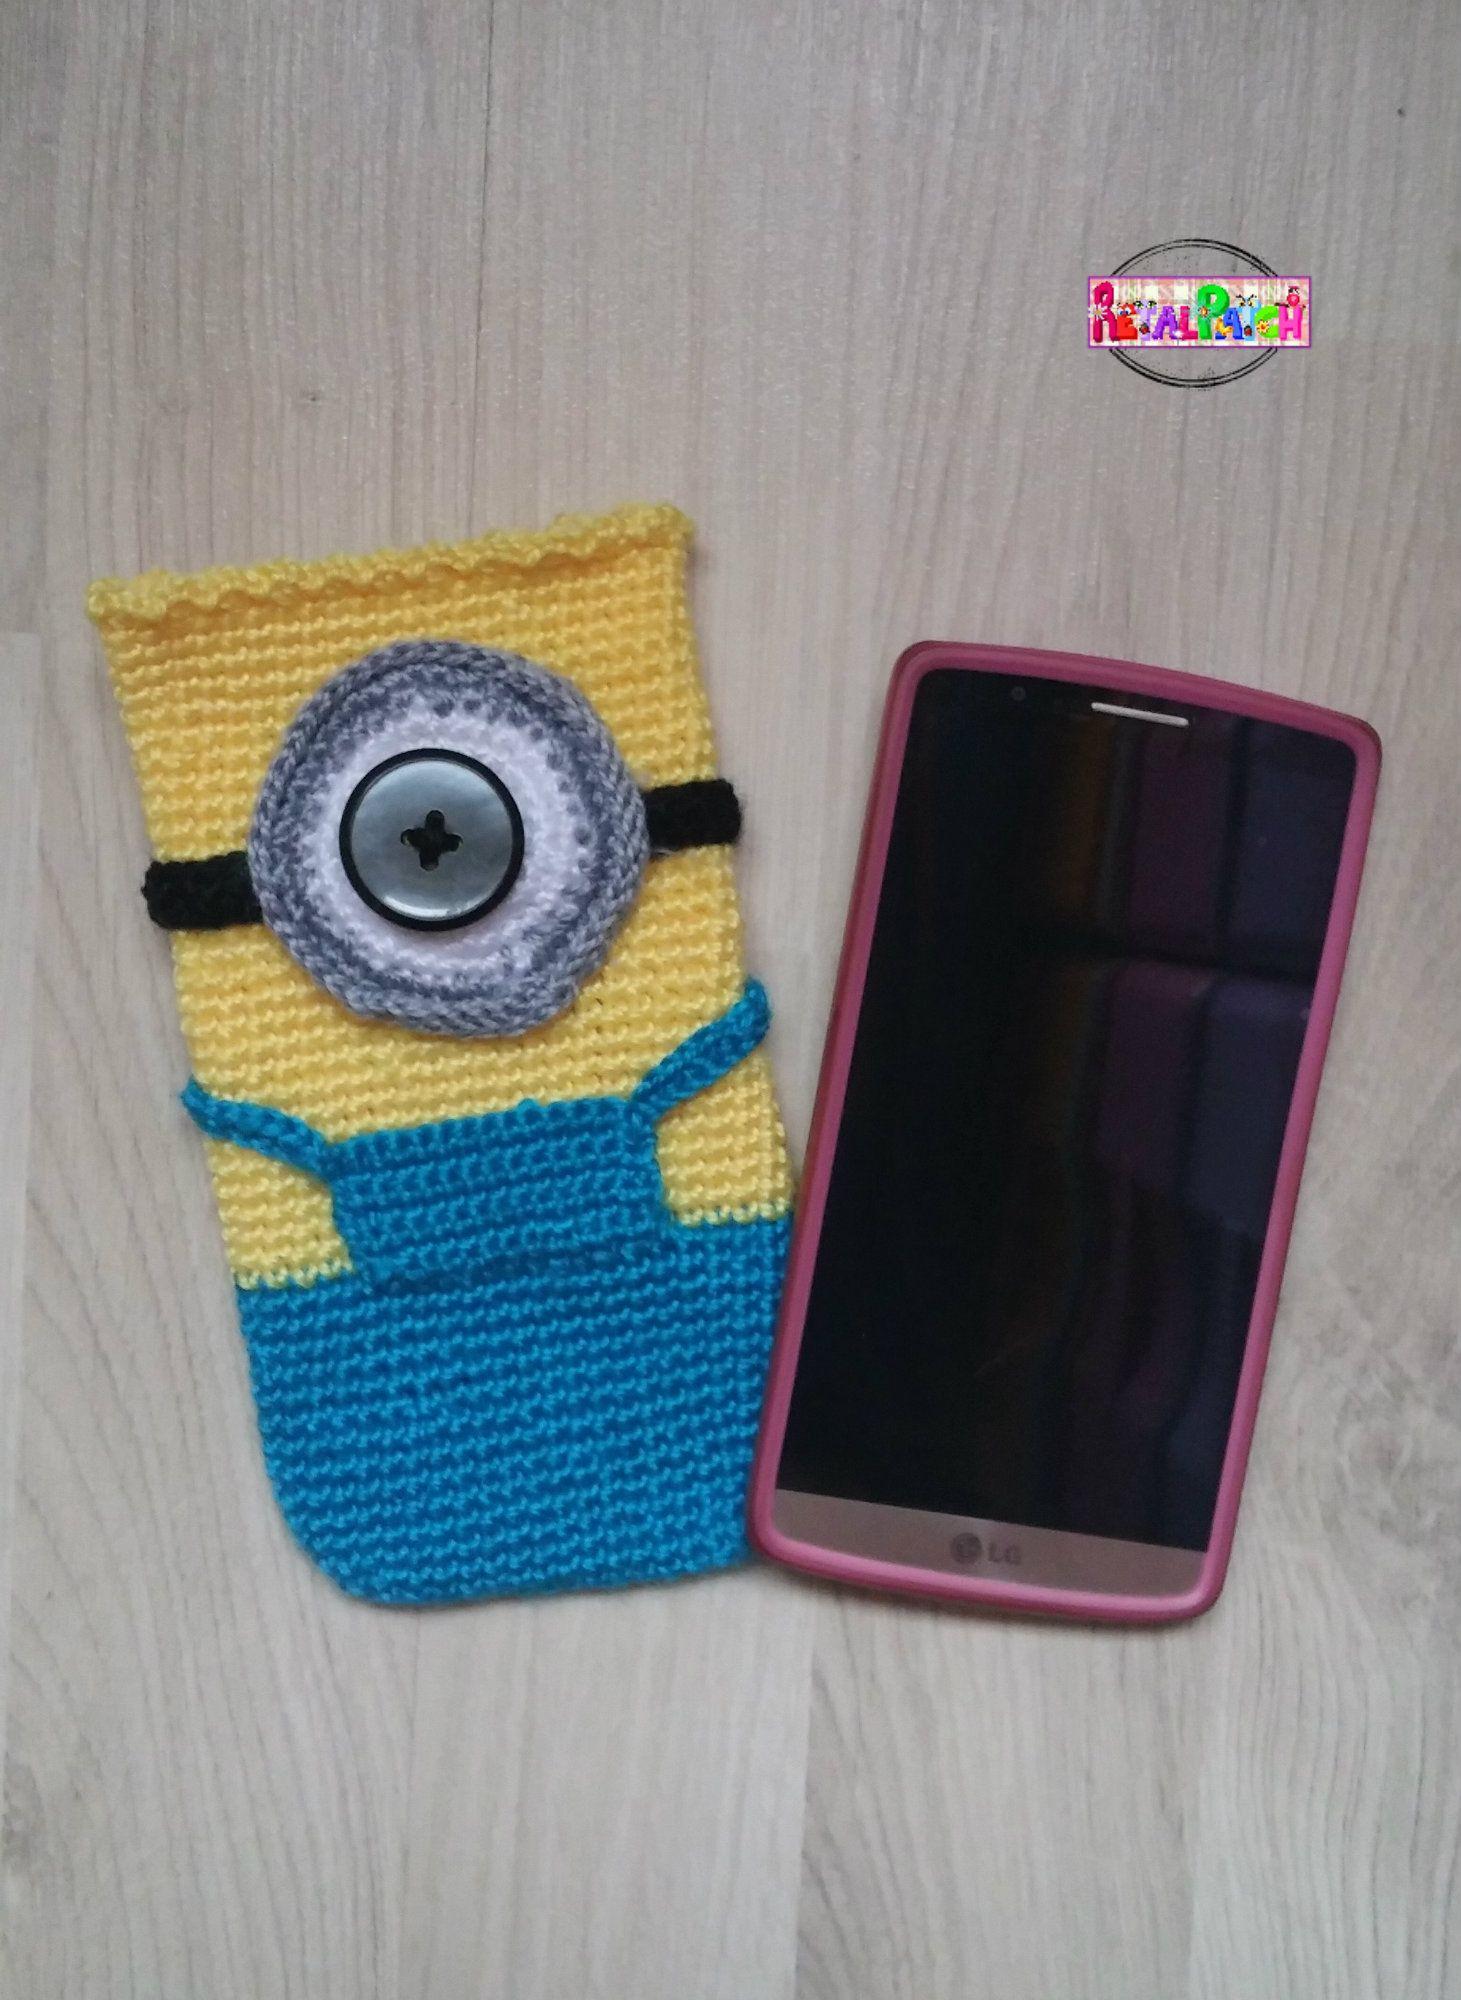 Fundas para móviles http://frilan-mirinconcito.blogspot.com.es/search/label/fundas%20para%20m%C3%B3viles